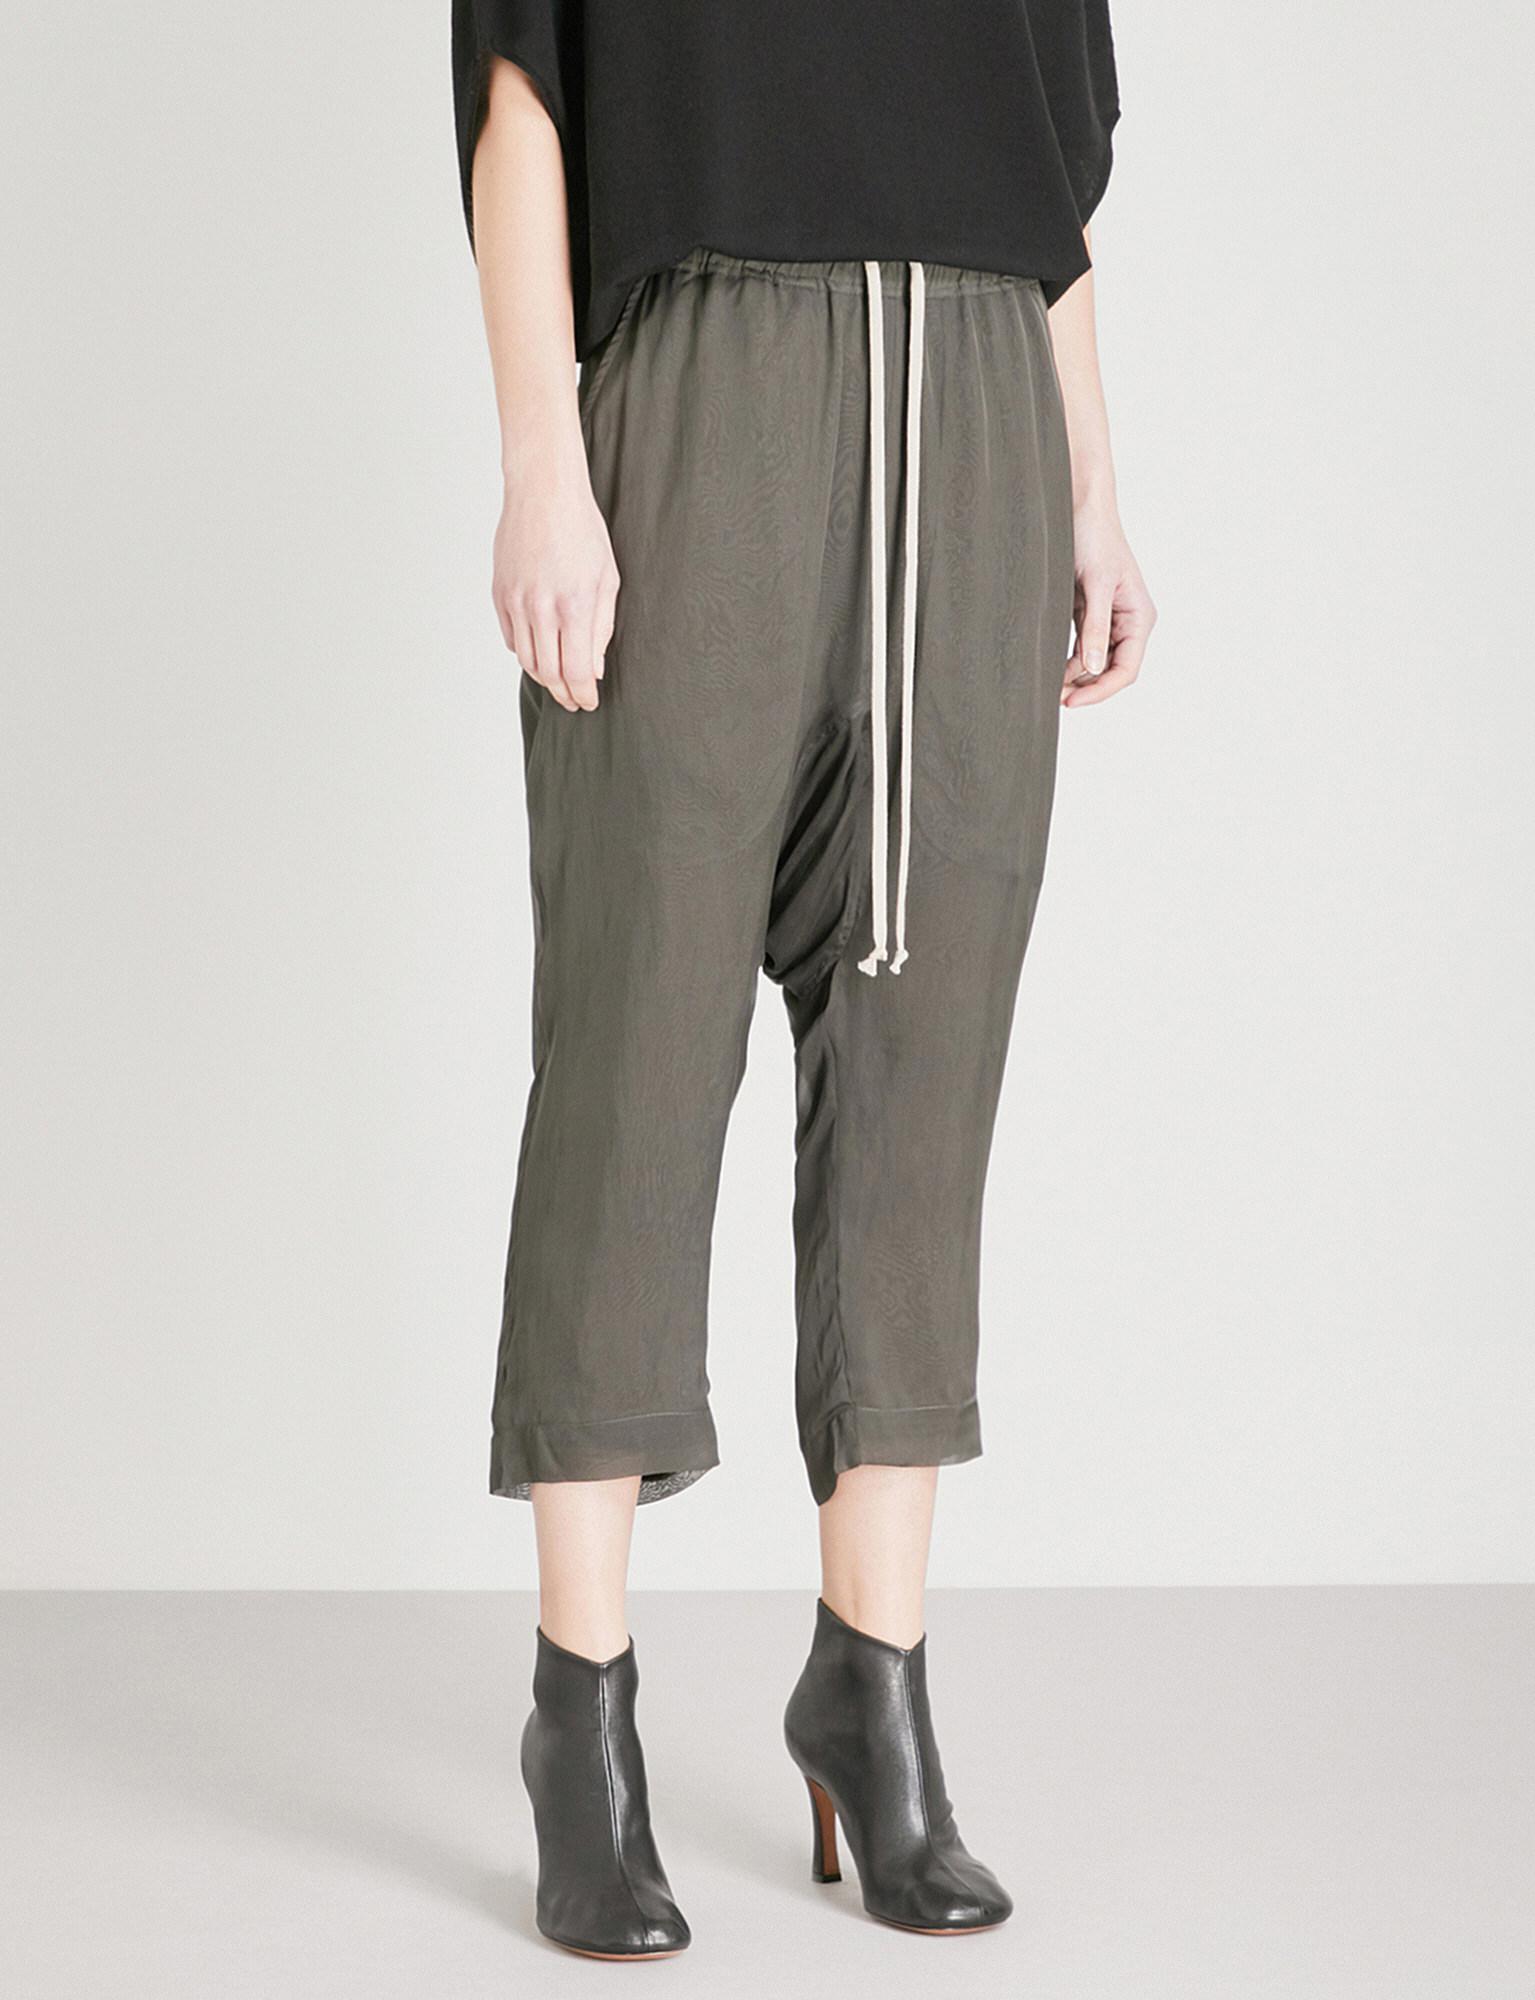 Womens Astair Stretch-Wool Drop-Rise Pants Rick Owens 5KPhzyDjzA